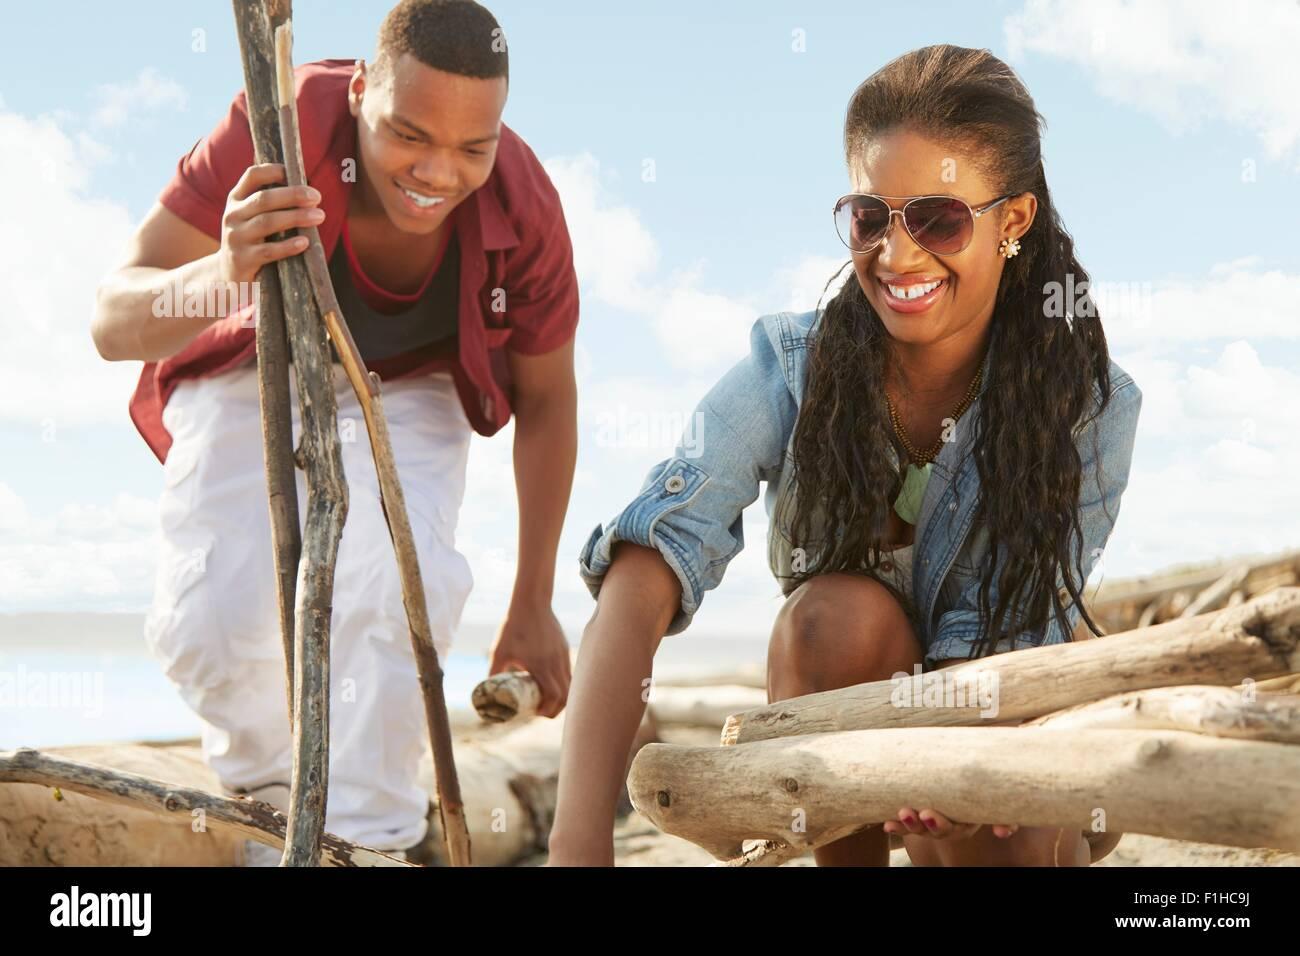 Junges Paar am Strand versammeln Treibholz Stockbild